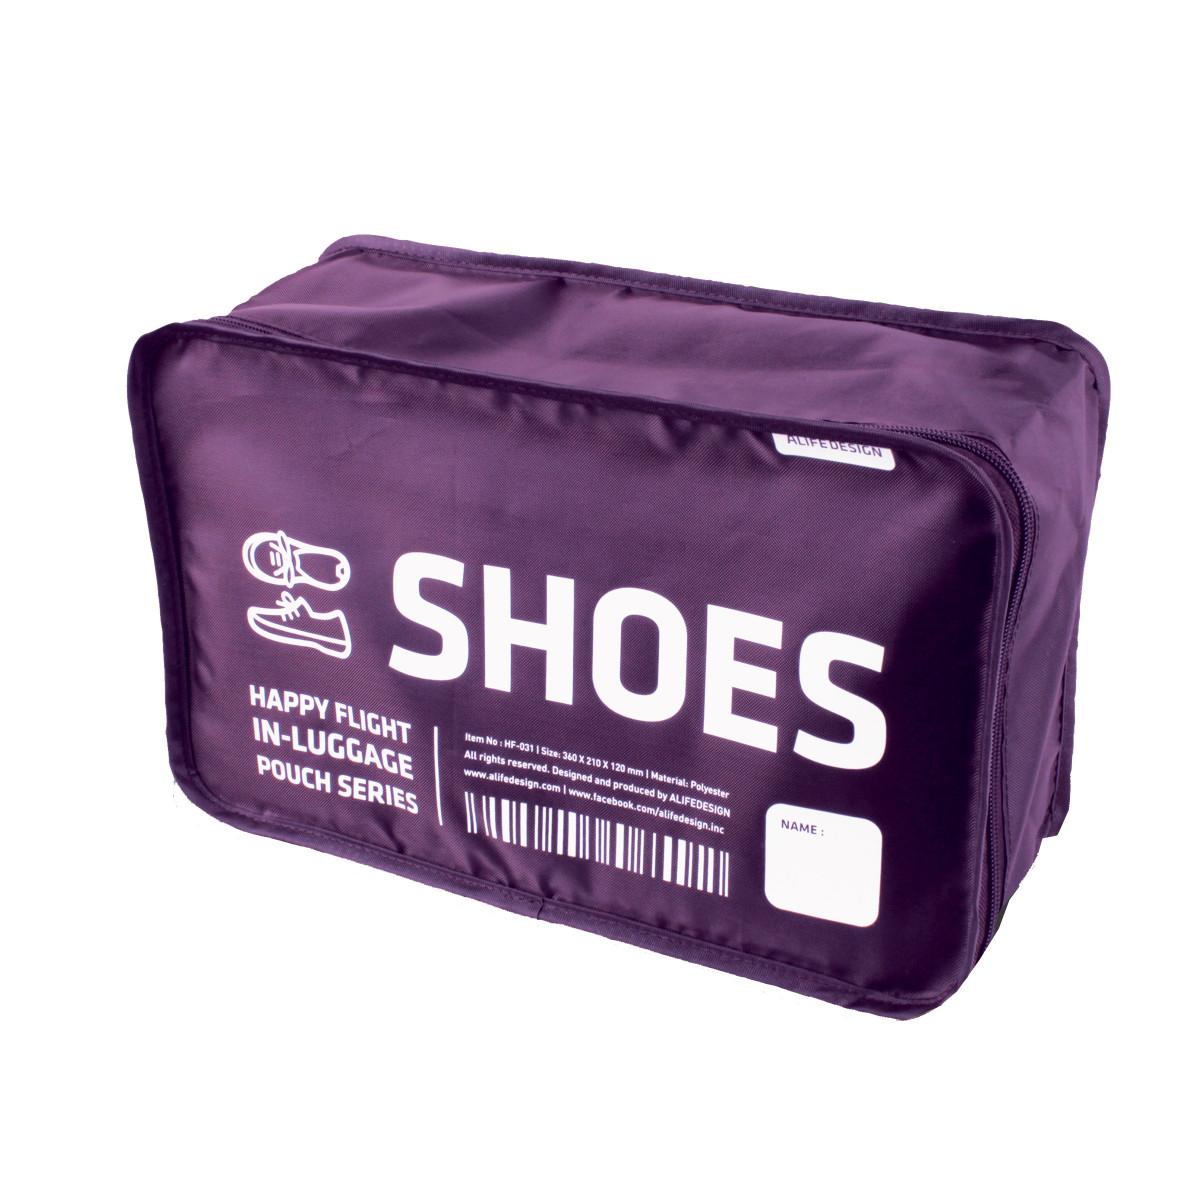 housse chaussures violette rangement valise